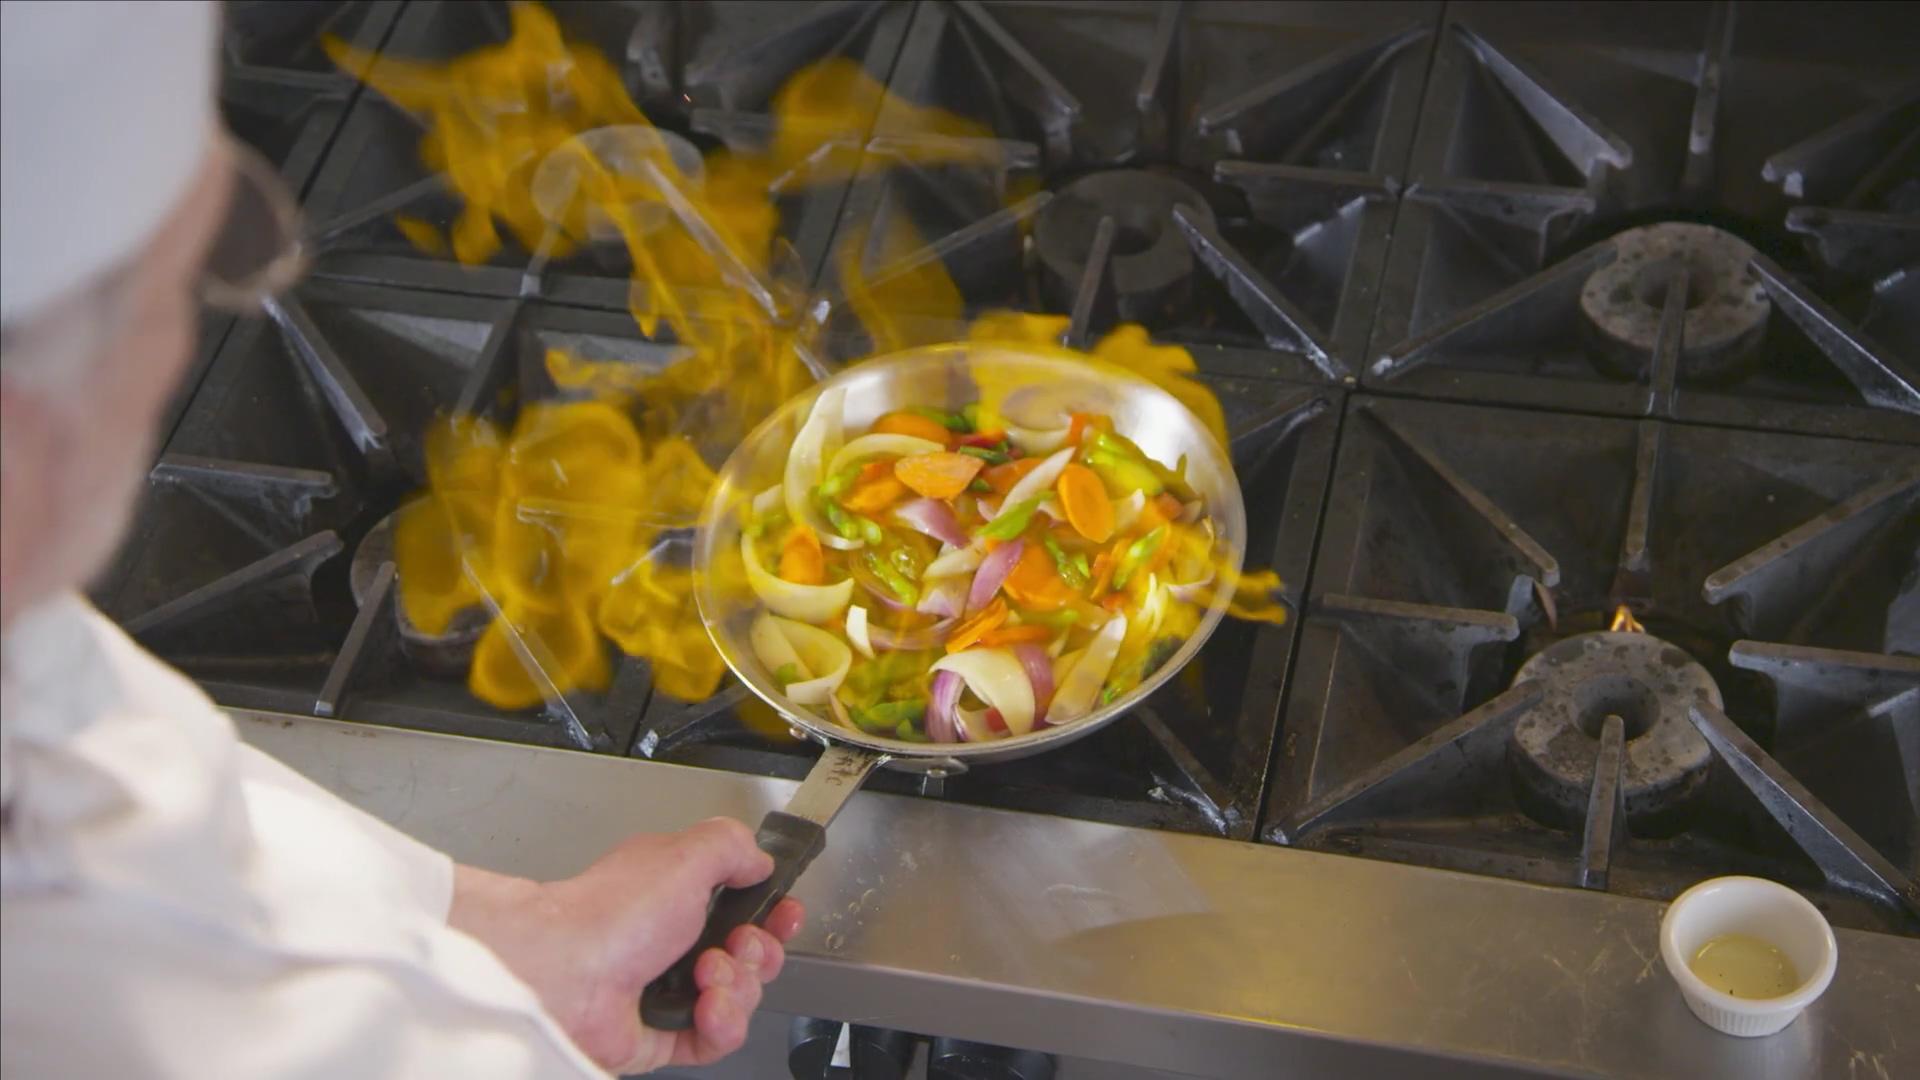 OEM-HP-Experience-Chef-Master-VMG-Studios